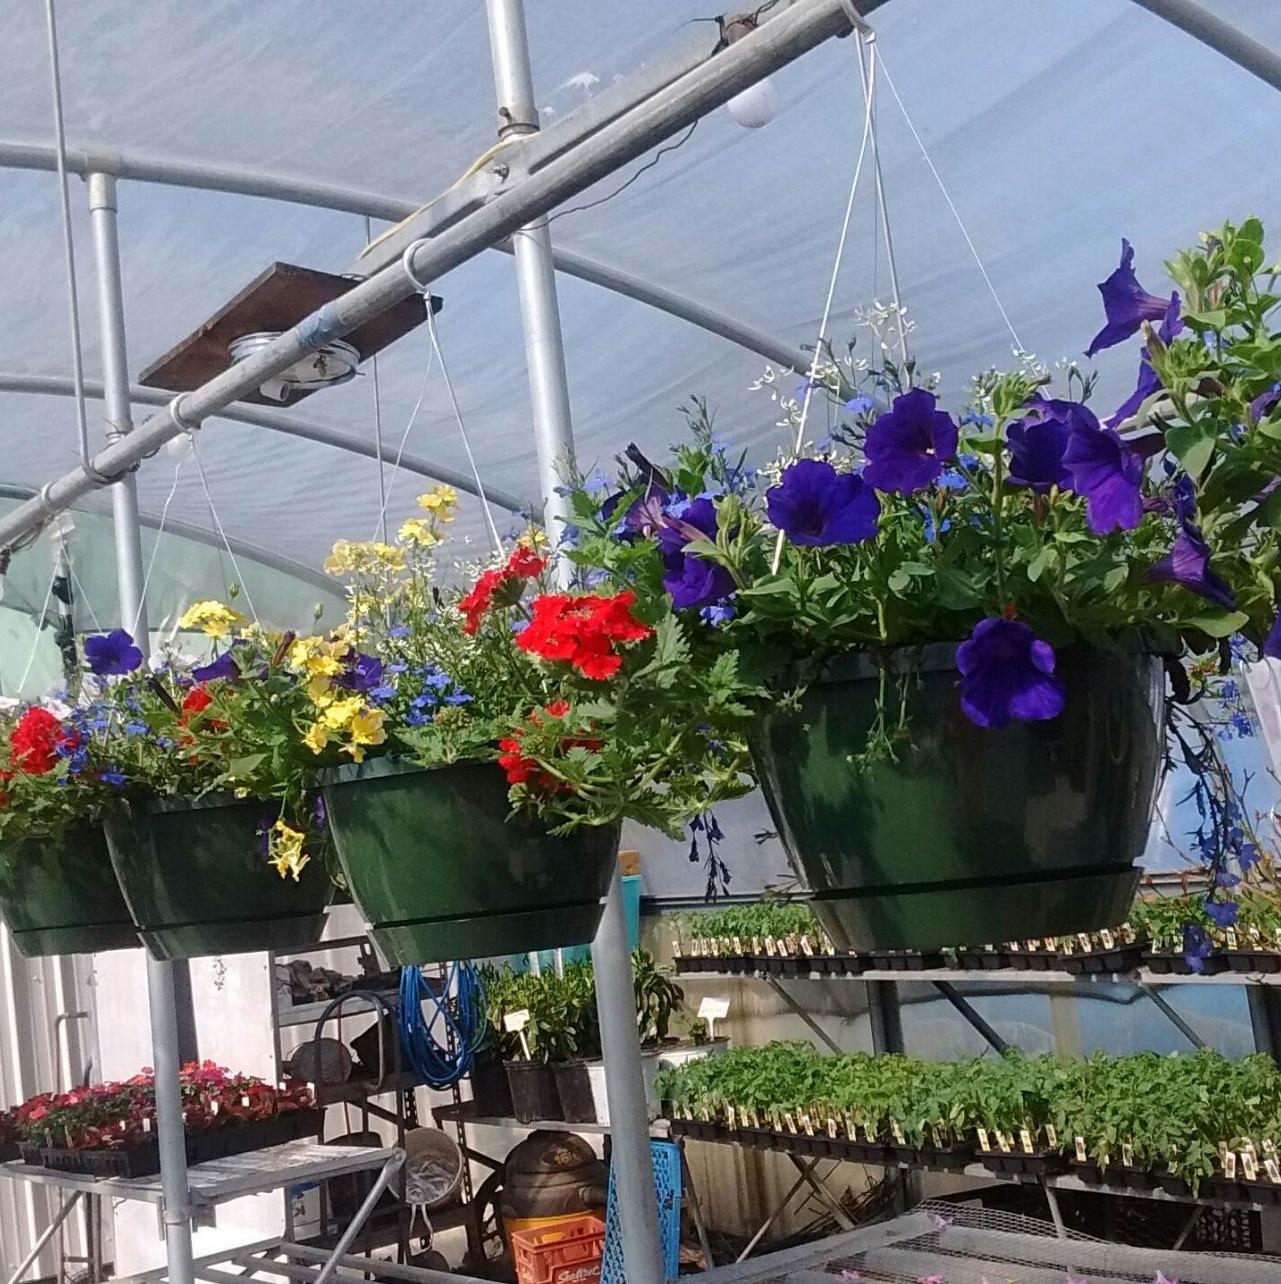 Shelby Nursery & Garden Center image 5